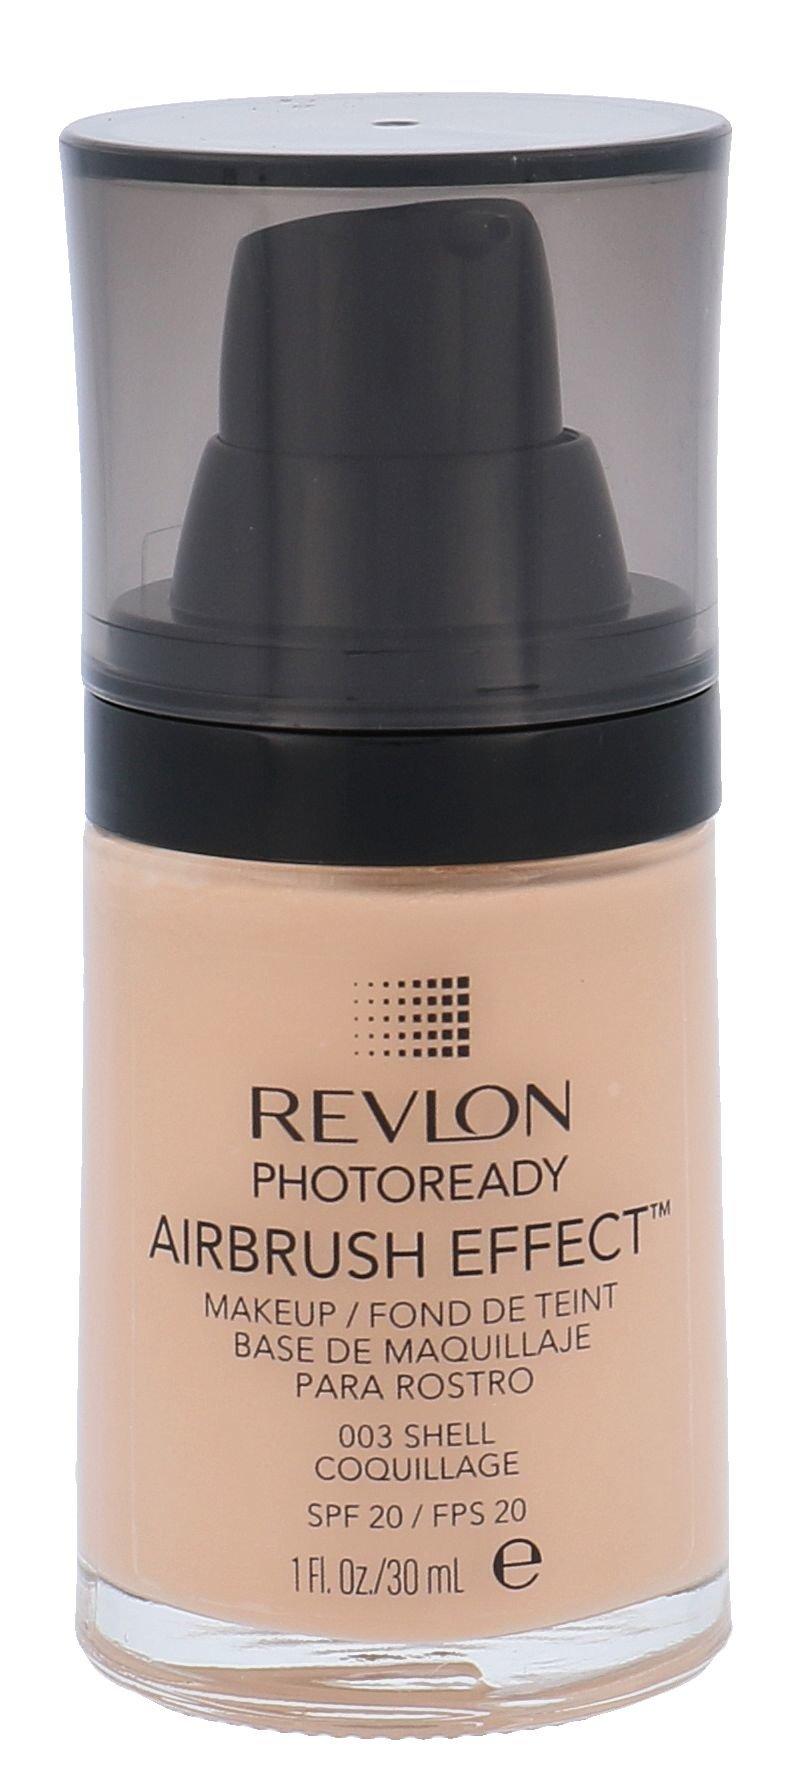 Revlon Photoready Cosmetic 30ml 003 Shell